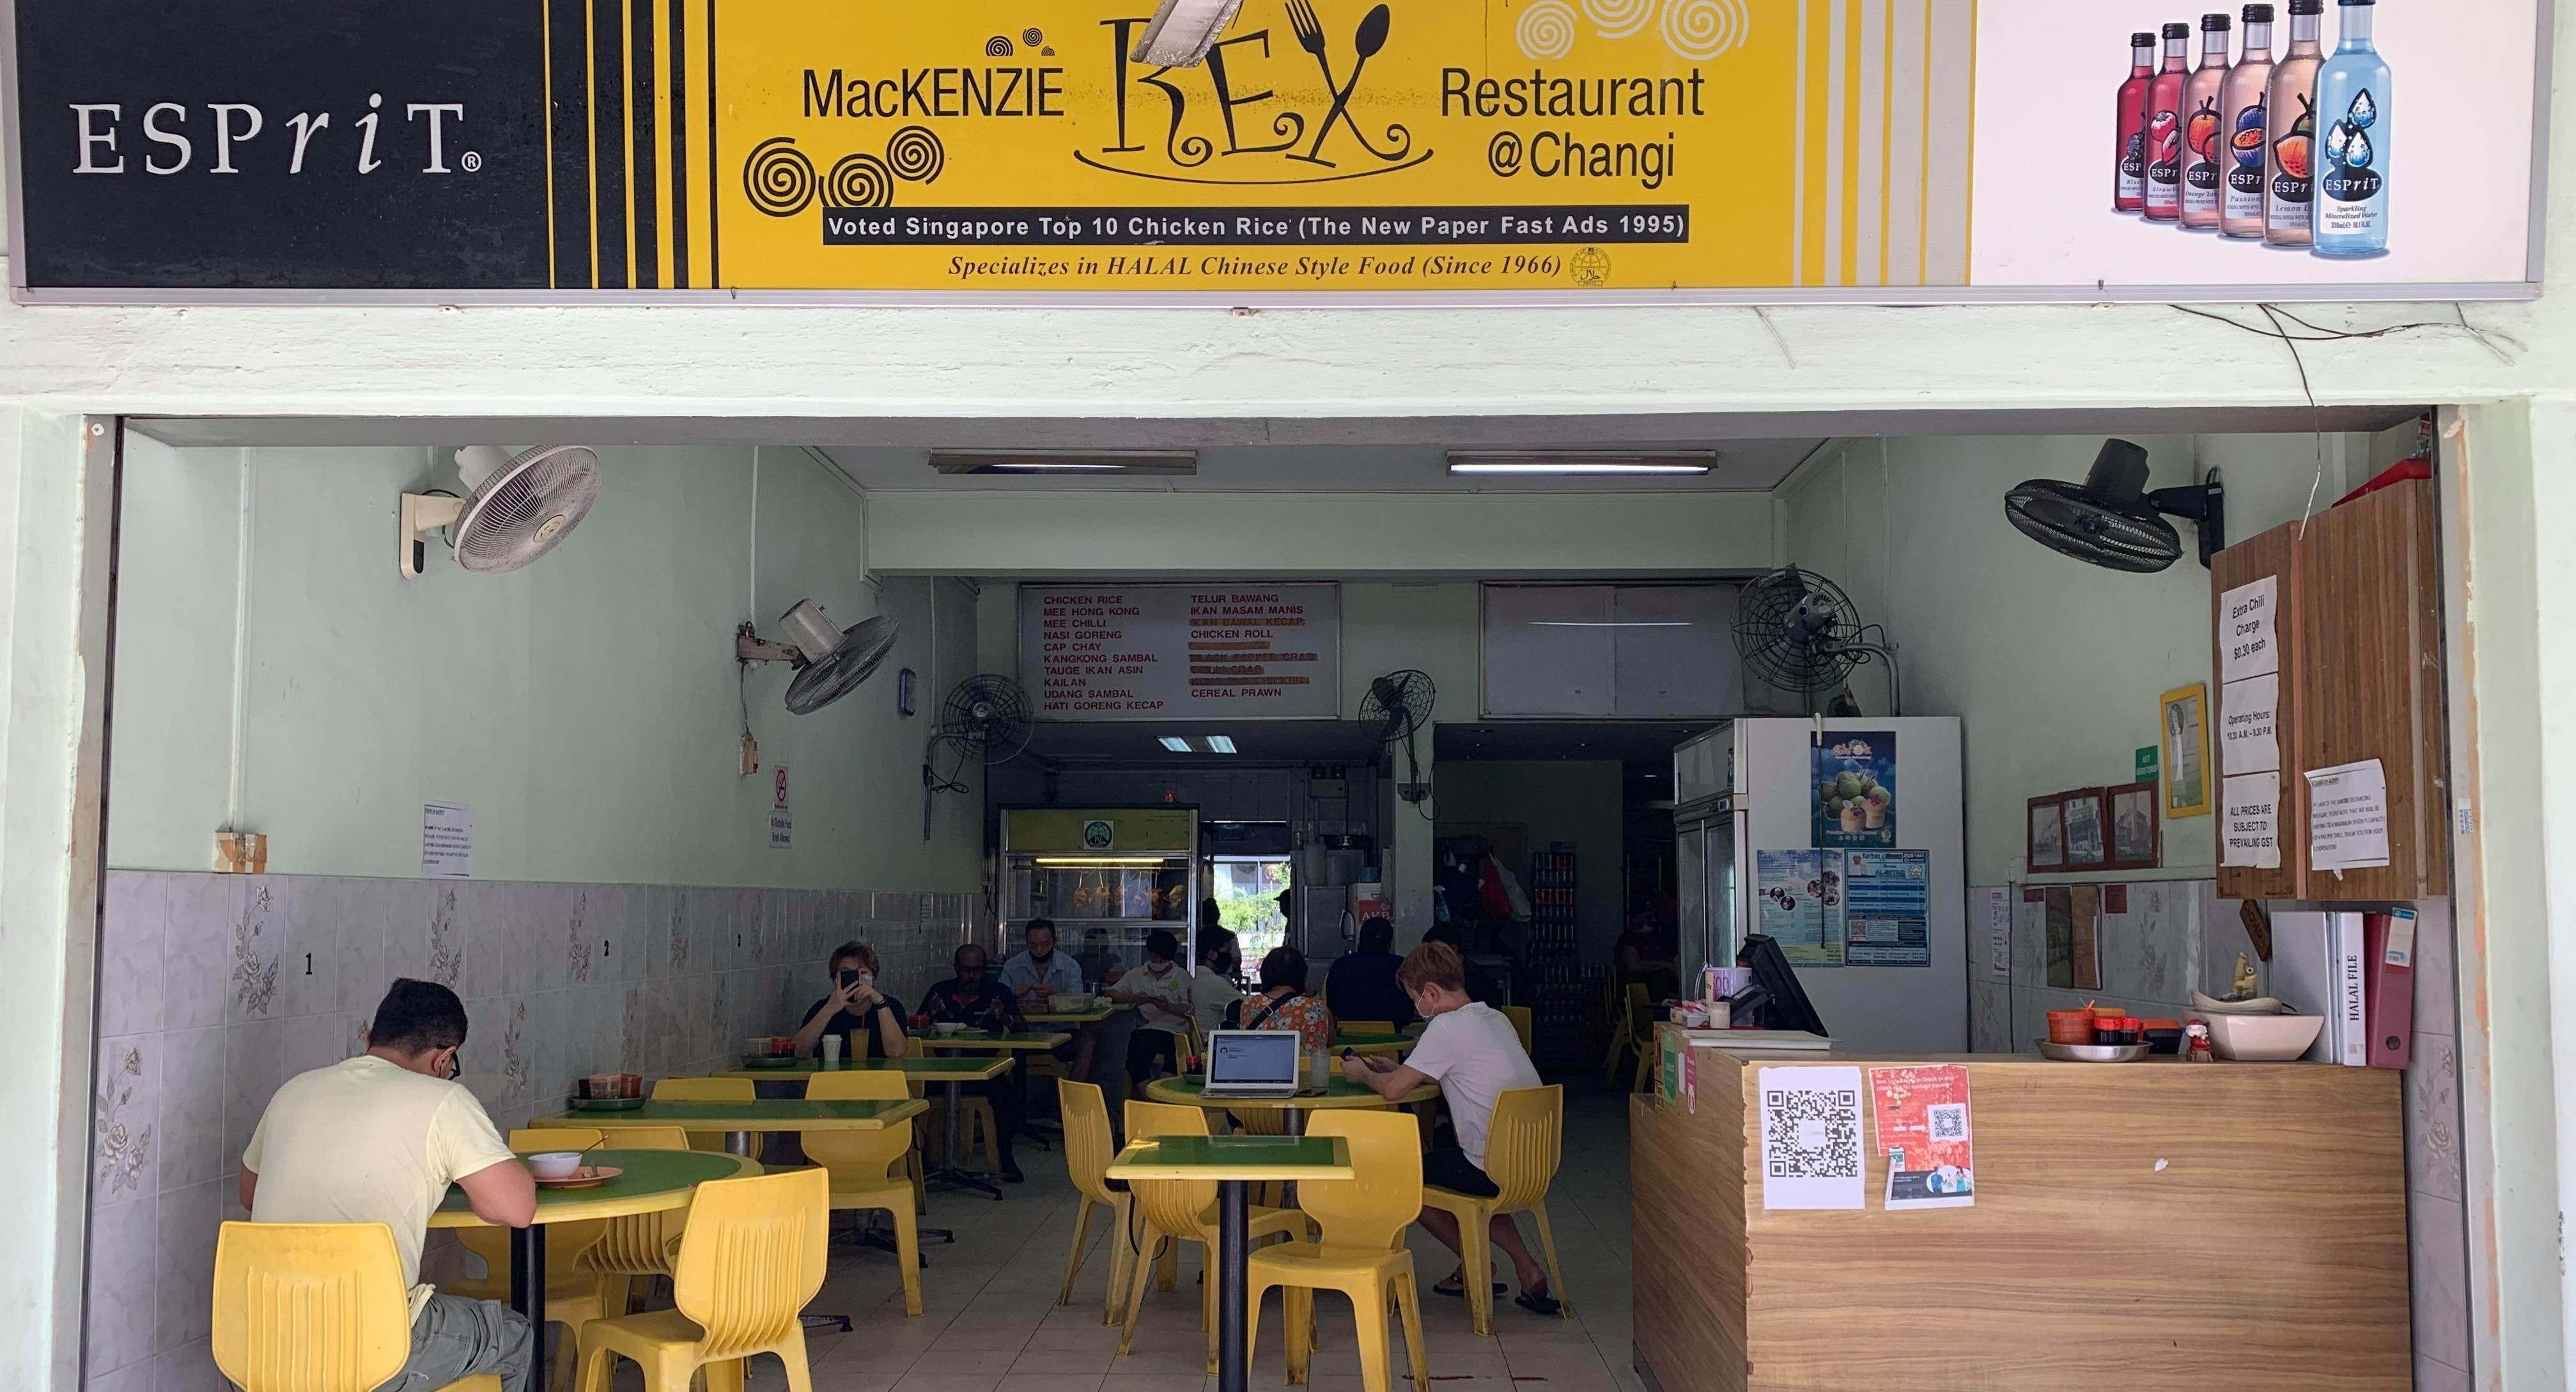 Mackenzie Rex Restaurant, Changi